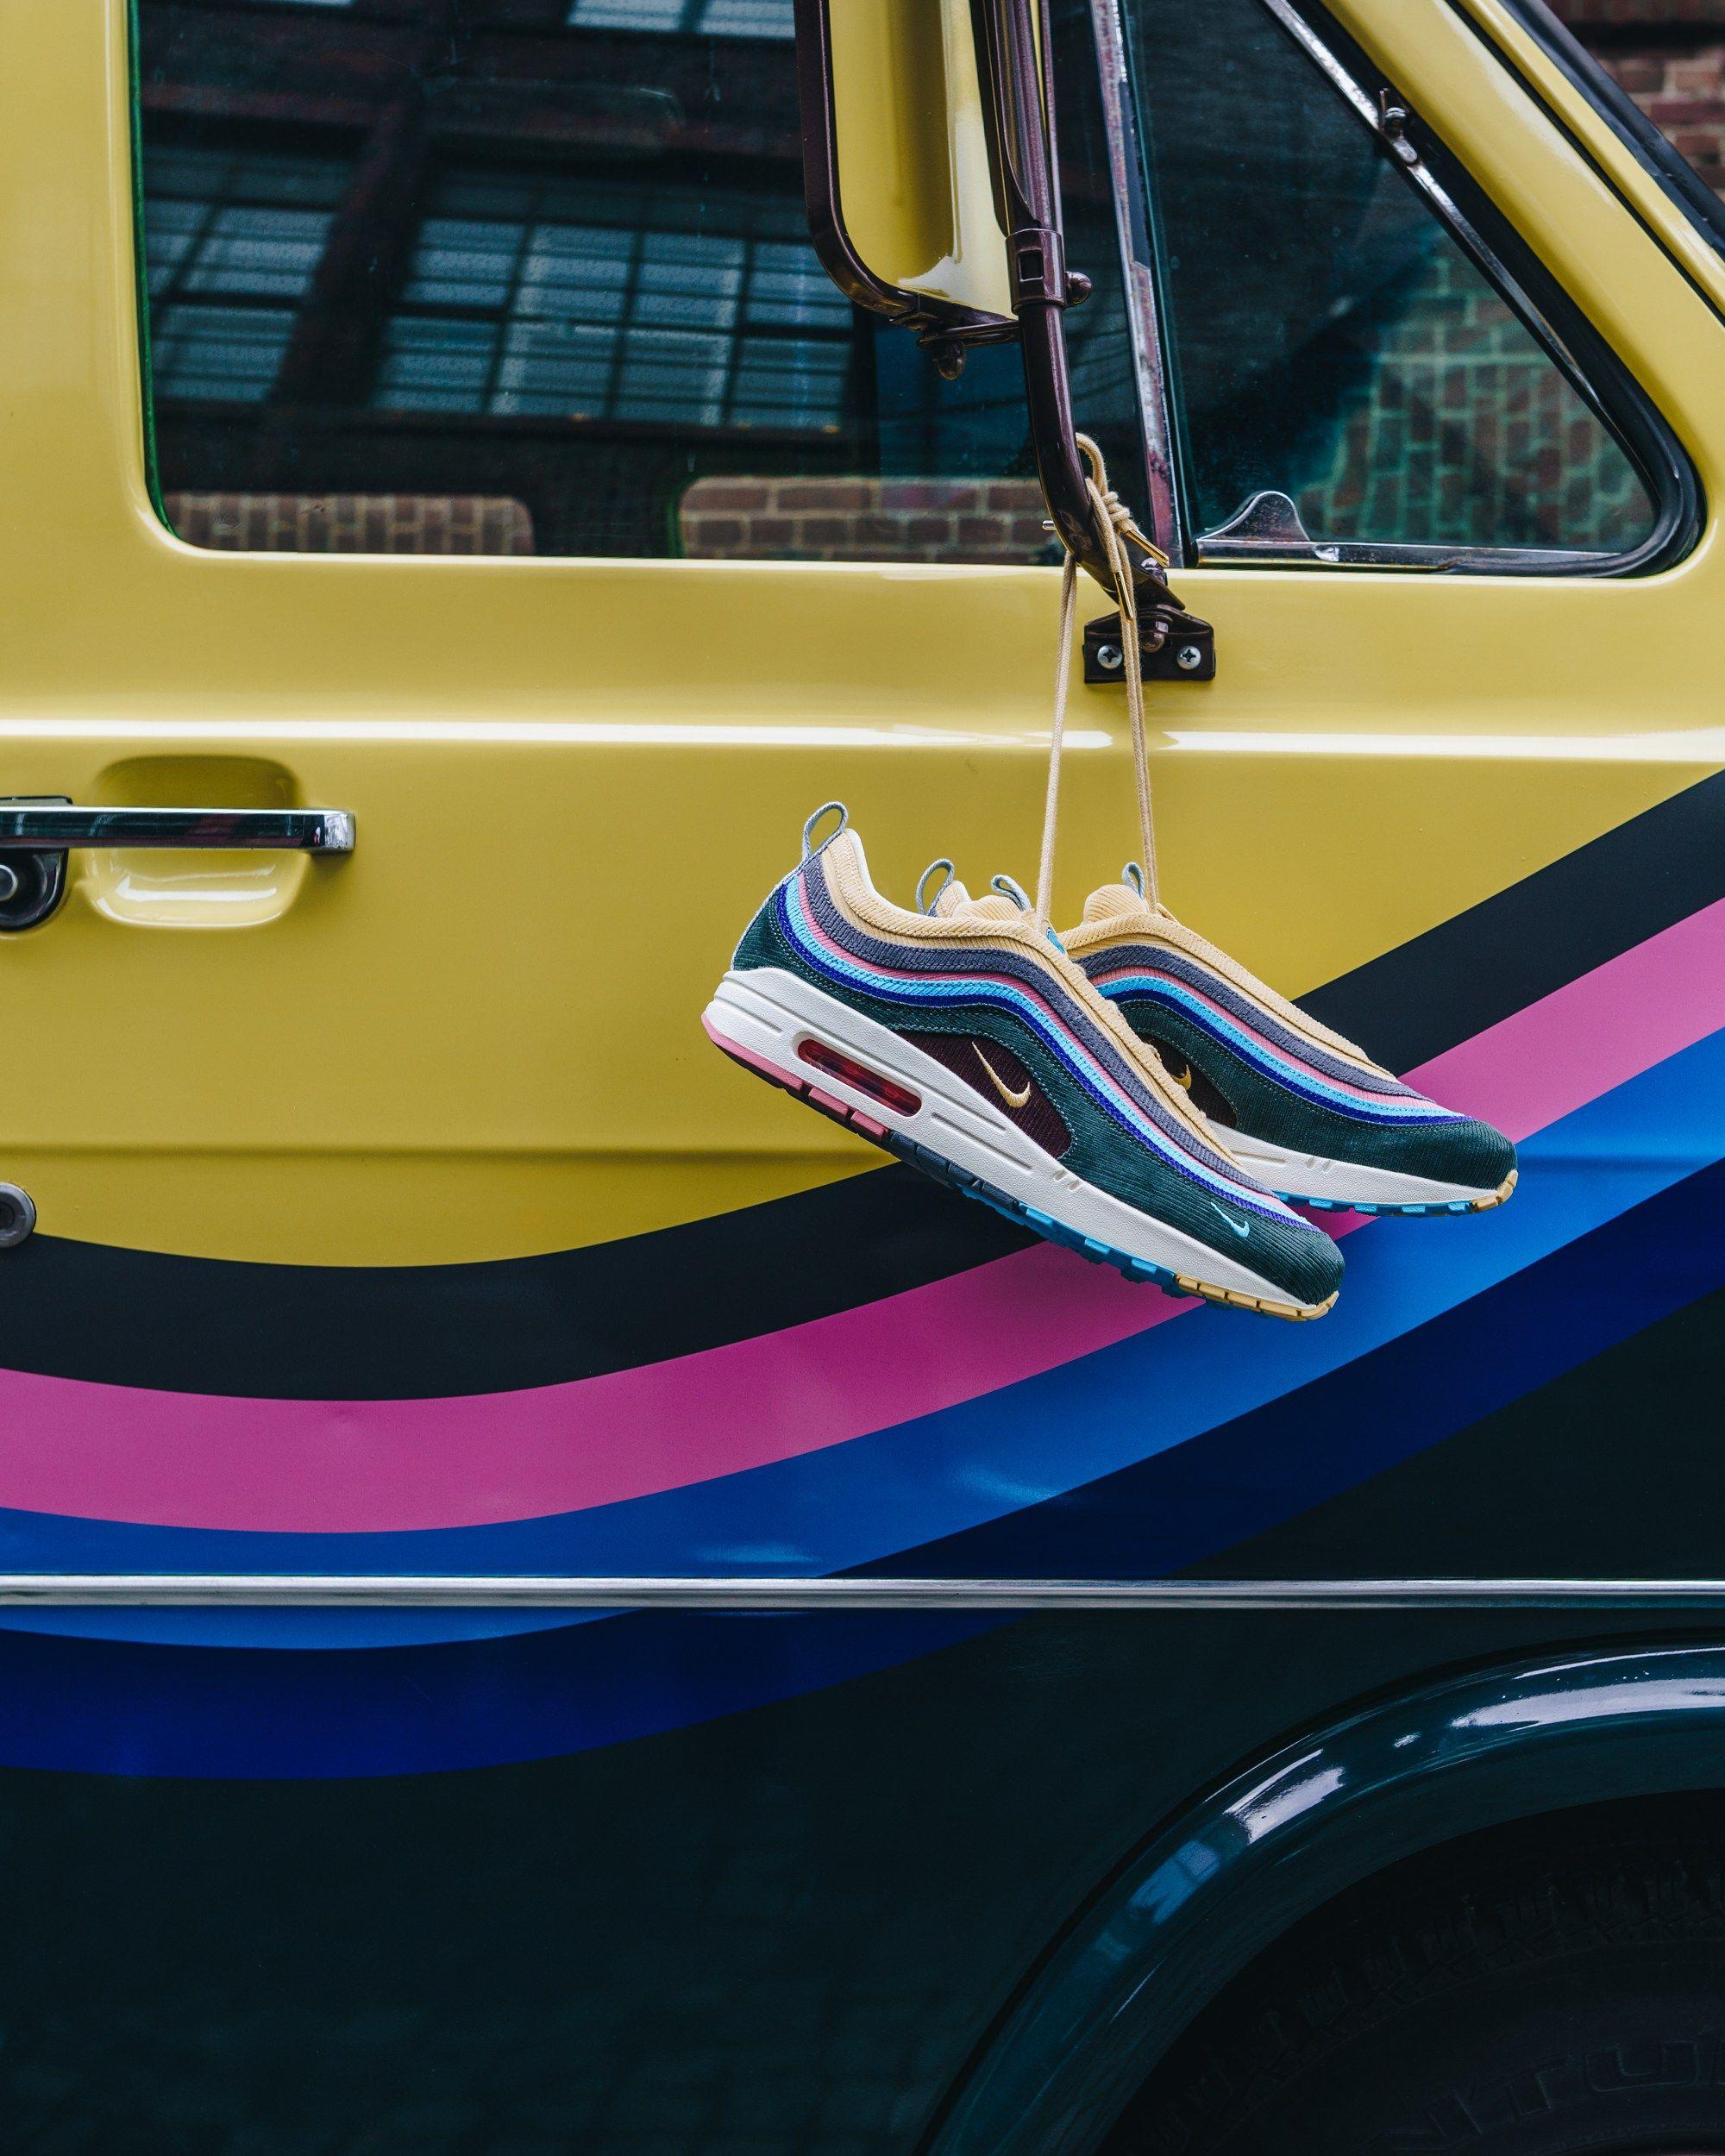 huge selection of 76a27 8c496 Sneaker Shop on Wheels: solebox